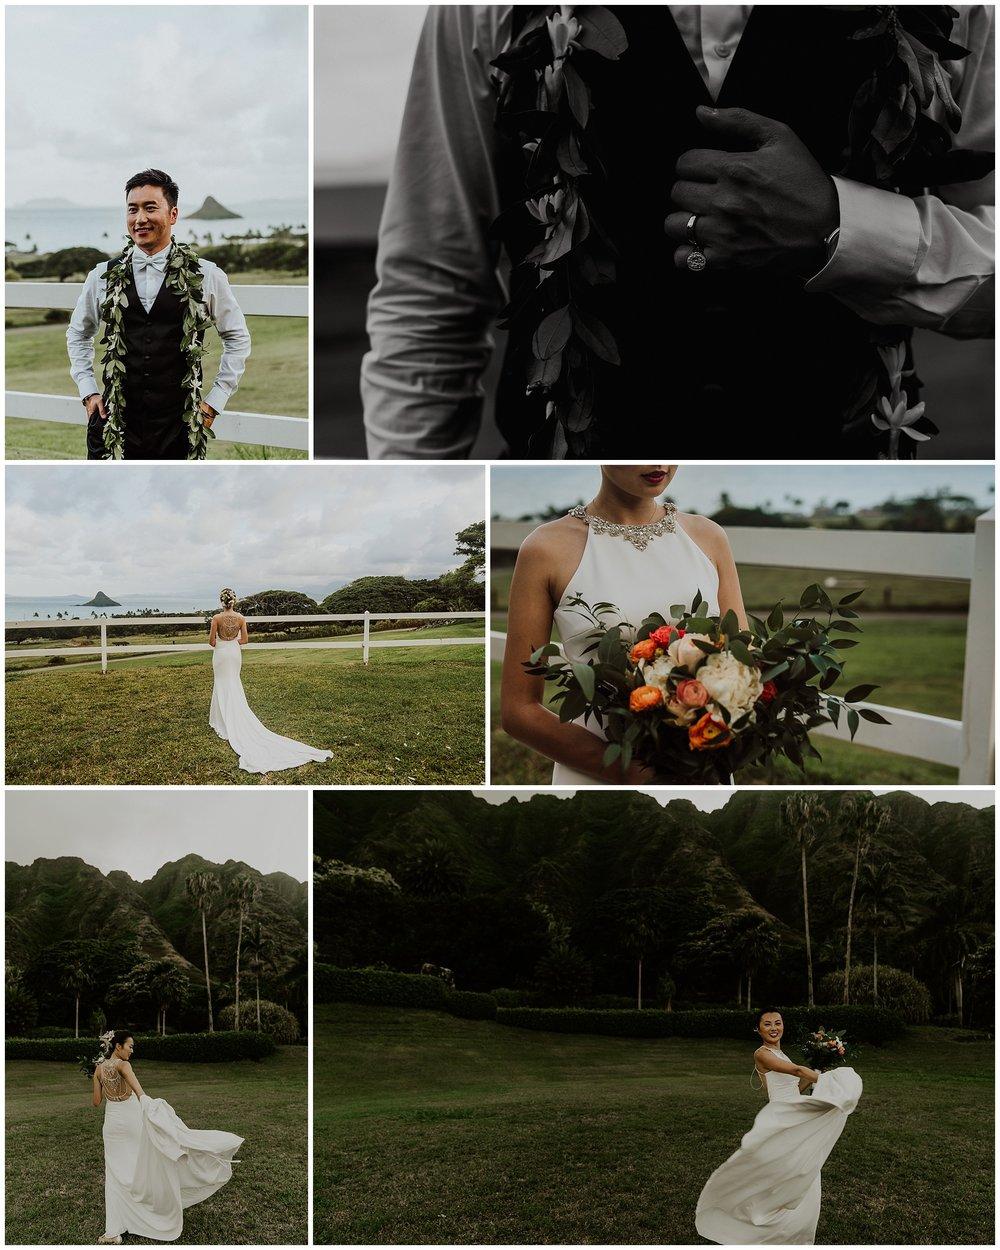 kualoa_ranch_wedding5.jpg